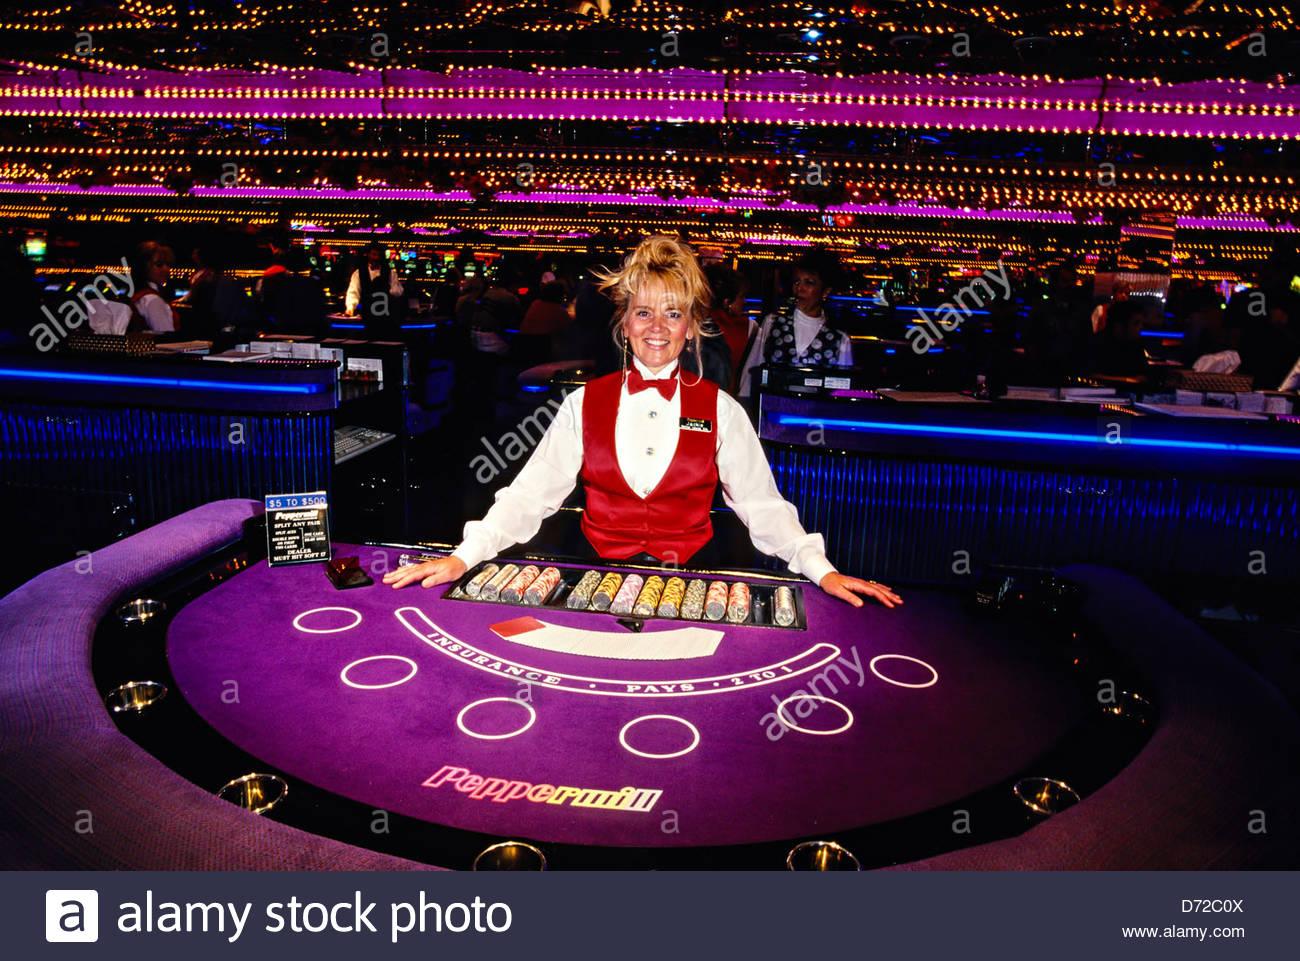 No deposit free spins real money casino